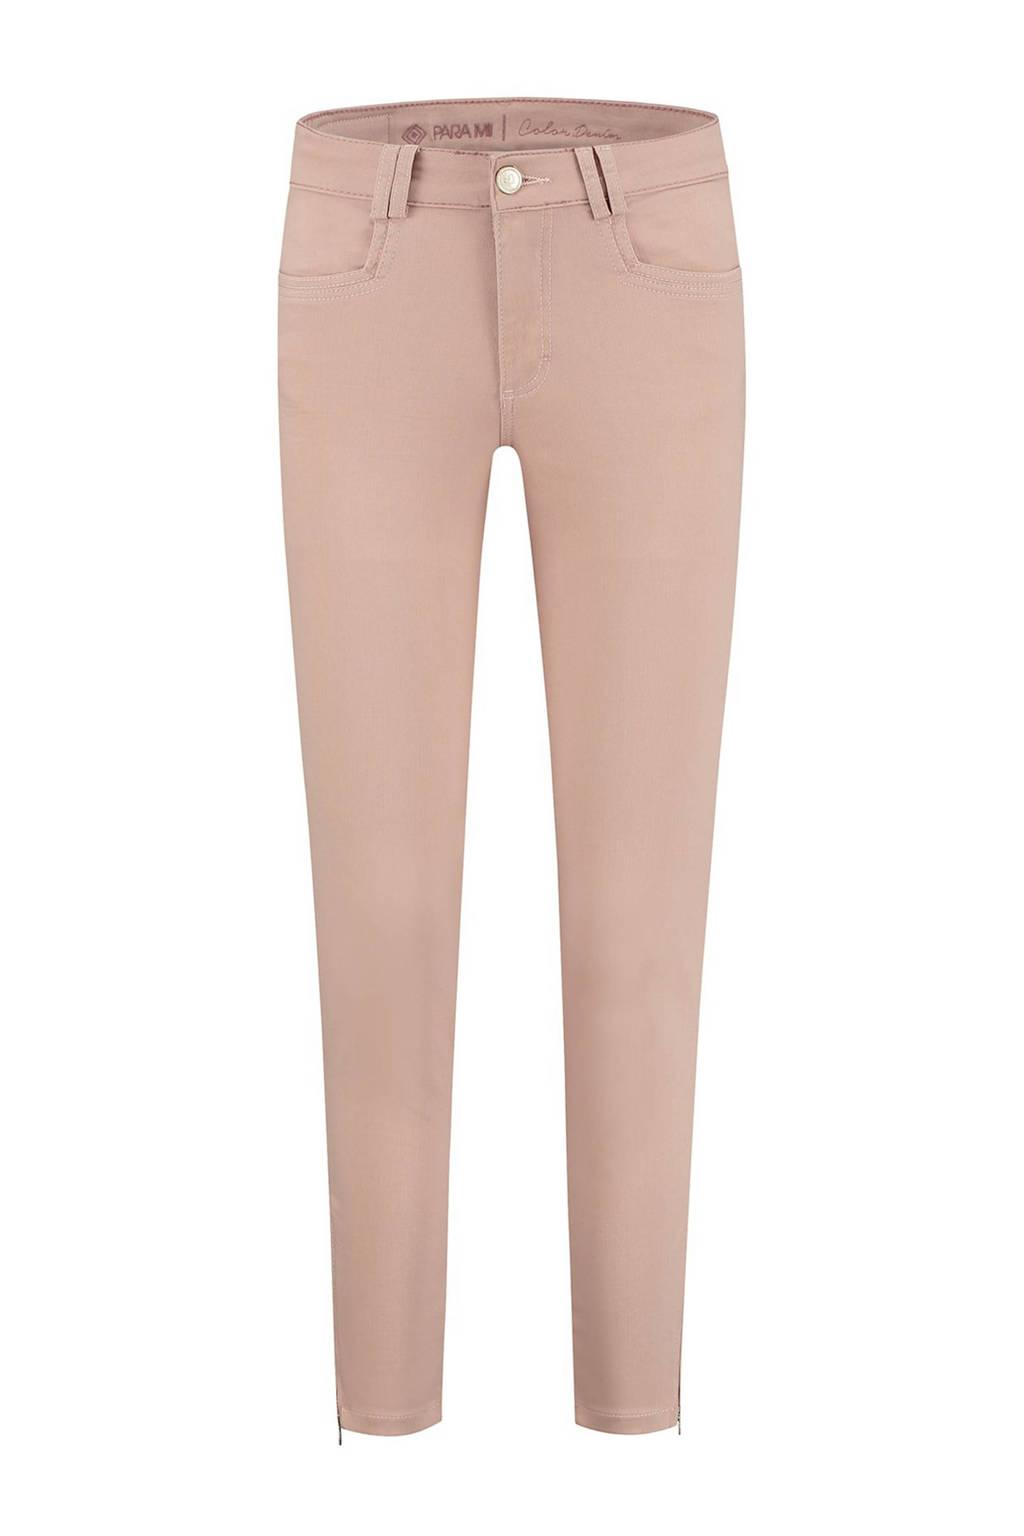 Para Mi skinny jeans Amber mellow rose, Mellow Rose